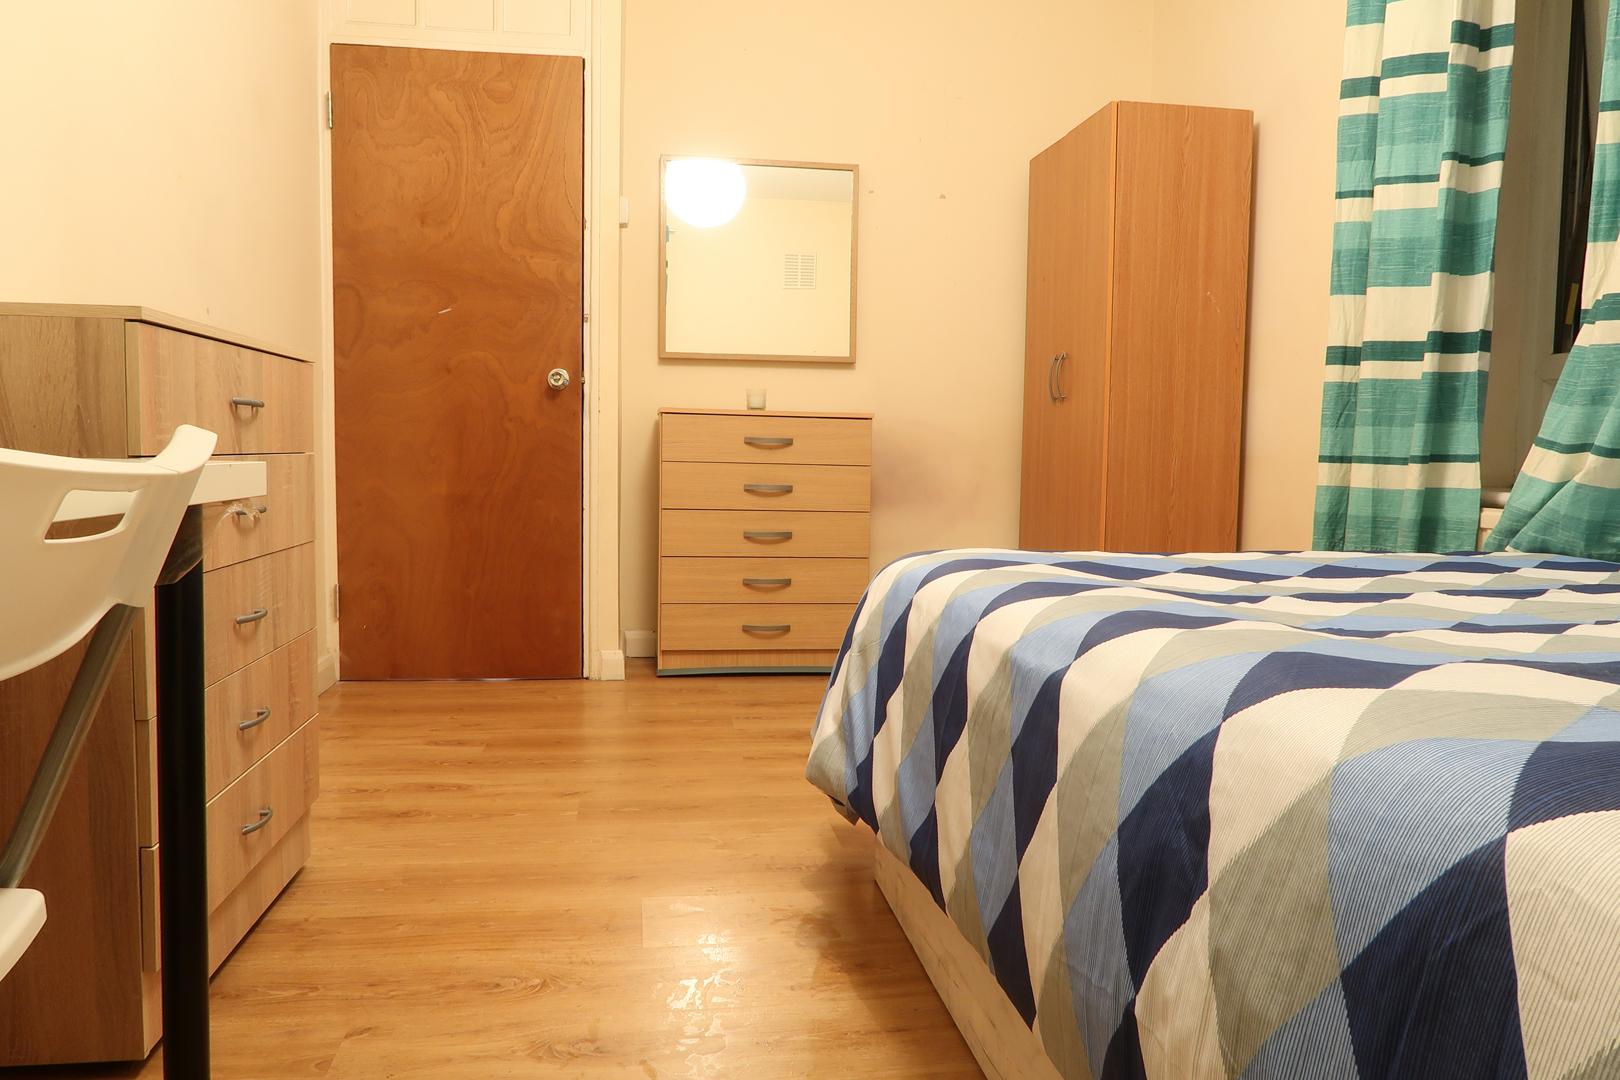 LIMBOROUGH HOUSE - DELUXE GUEST ROOM 4 photo 20447798